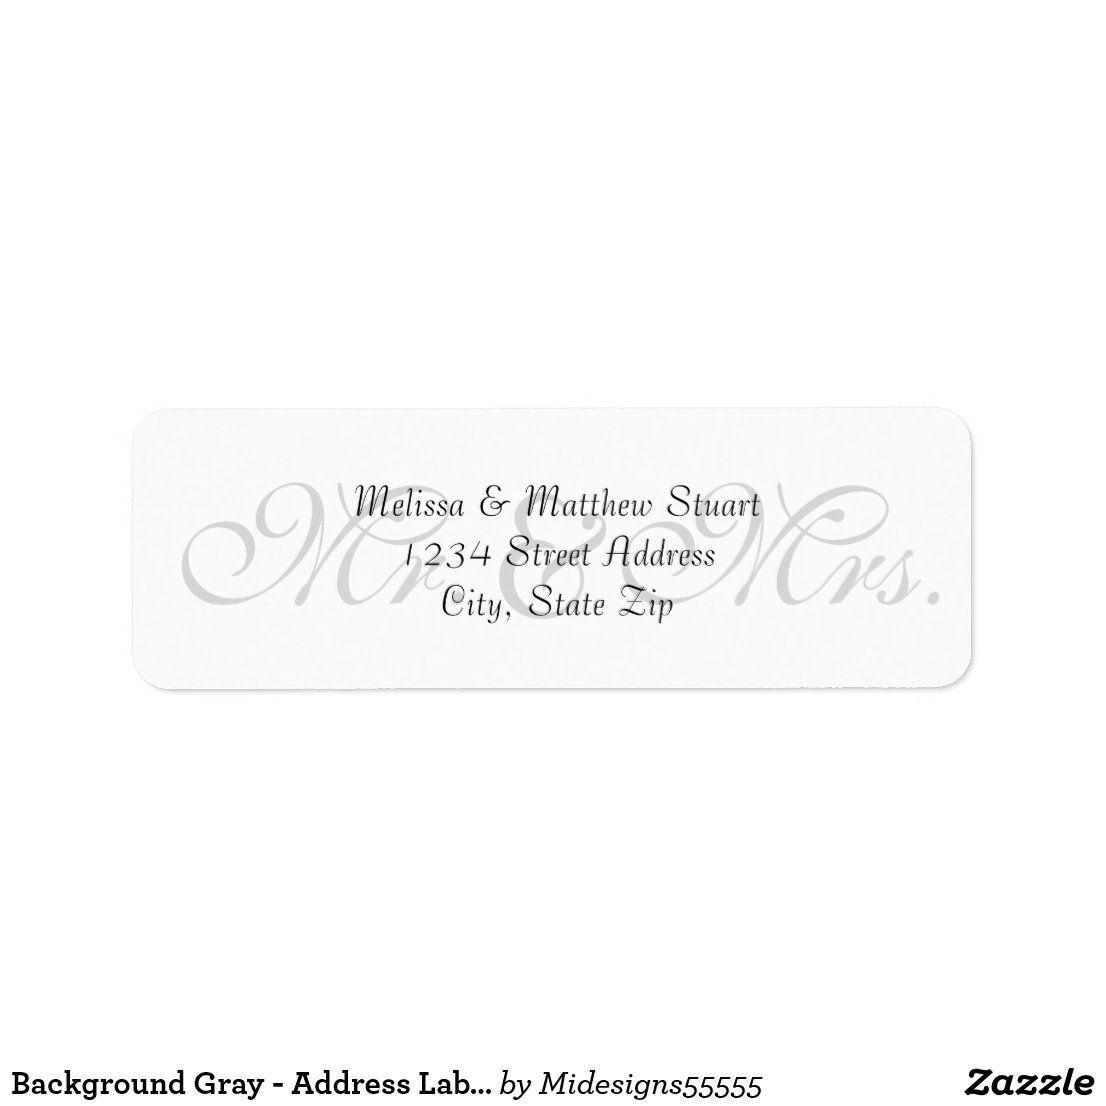 Background Gray - Address Labels | Zazzle.com #lipsbackground